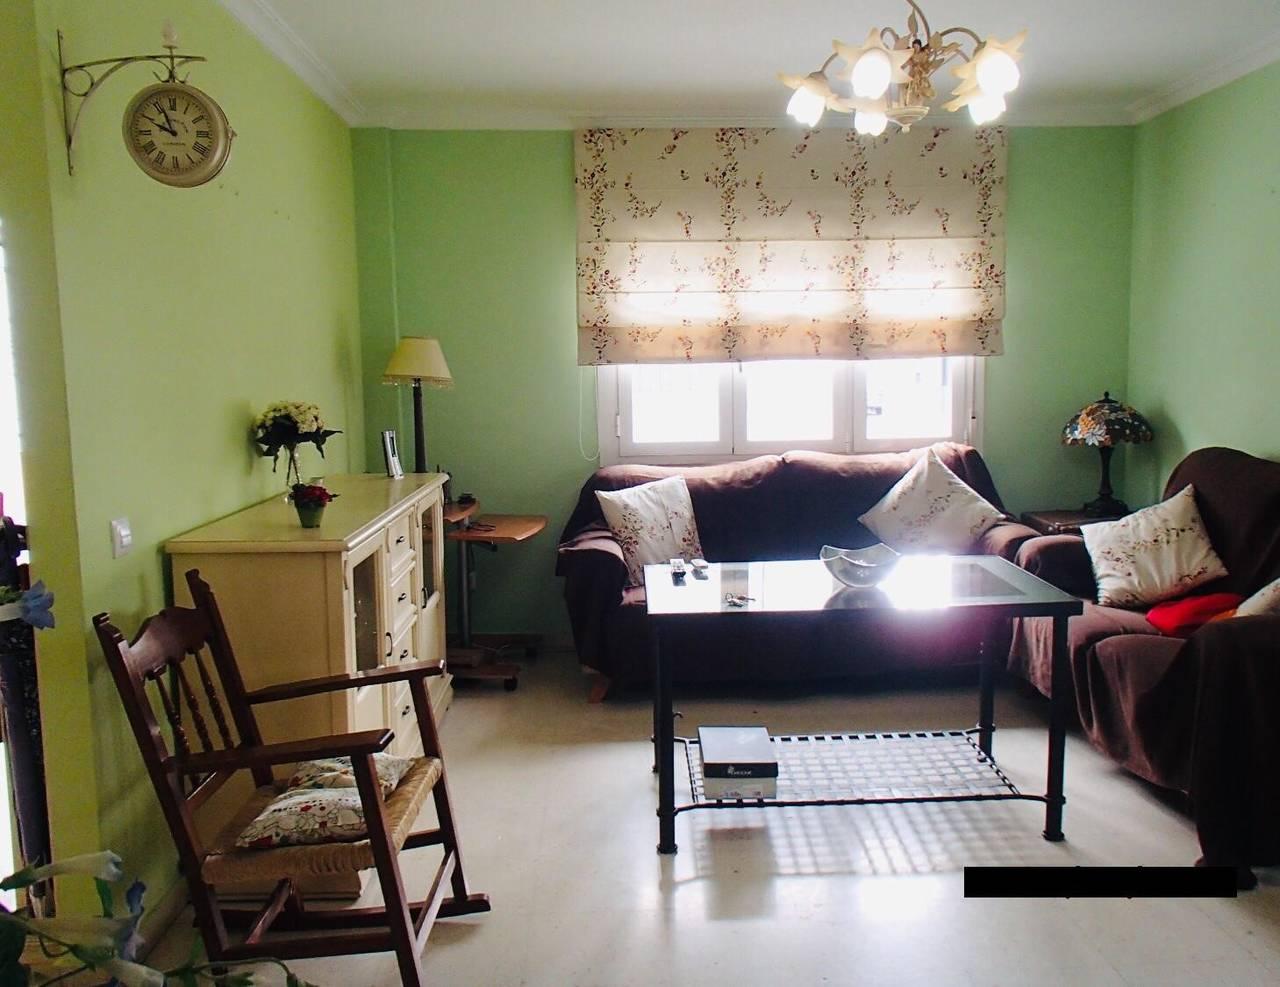 Particular alquila/vende preciosa casa adosada esquinera Coria del Rio  - Foto 1